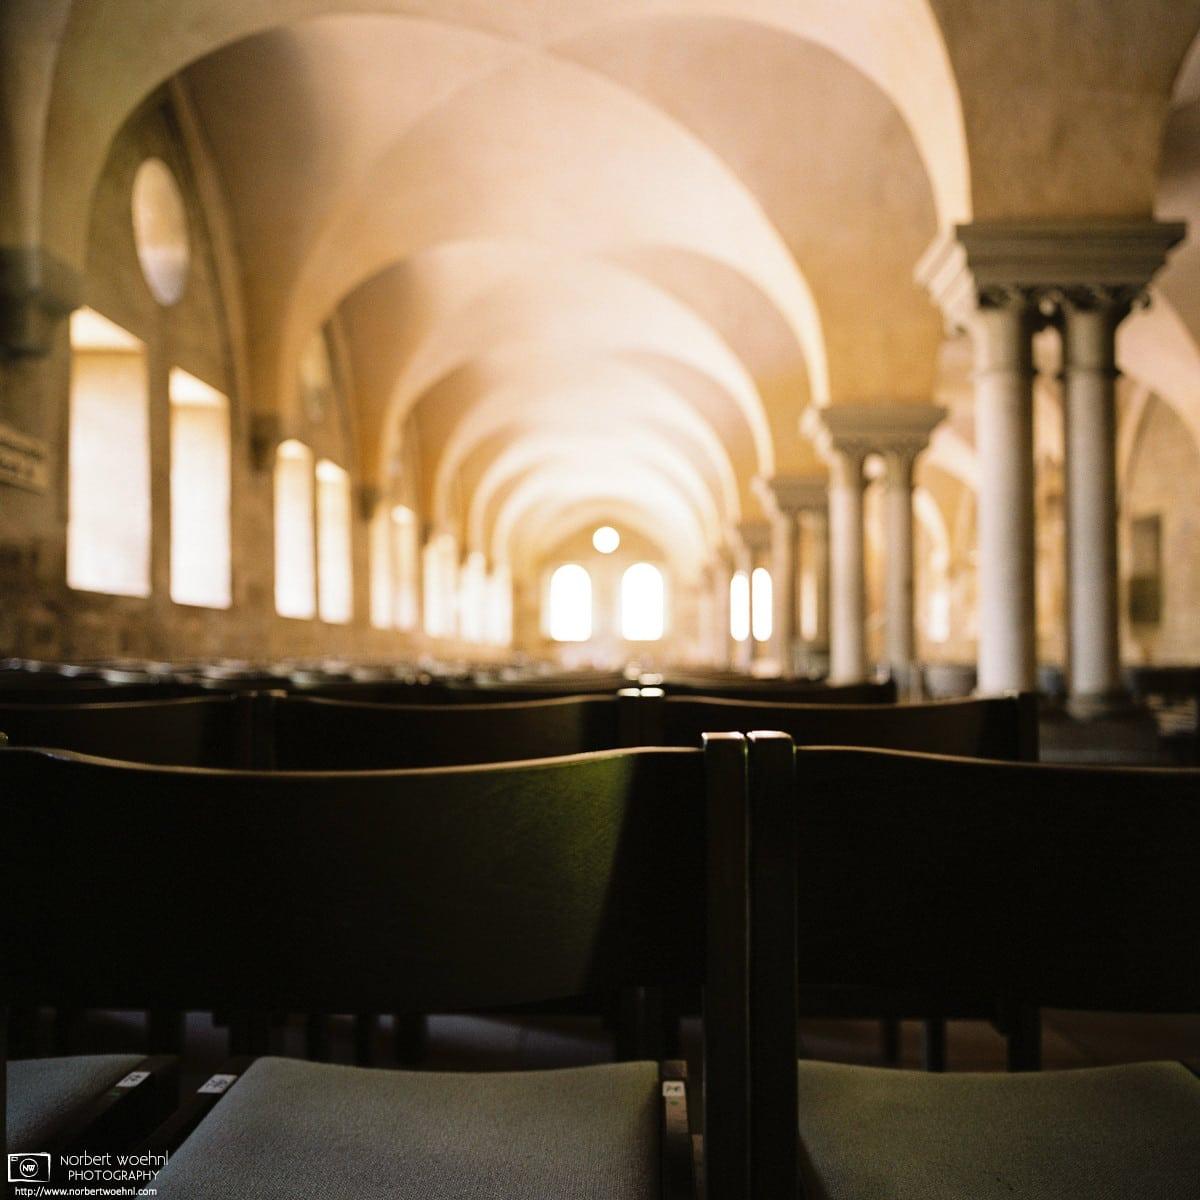 Lay Refectory (shot on Color Film), Maulbronn Monastery, Germany Photo